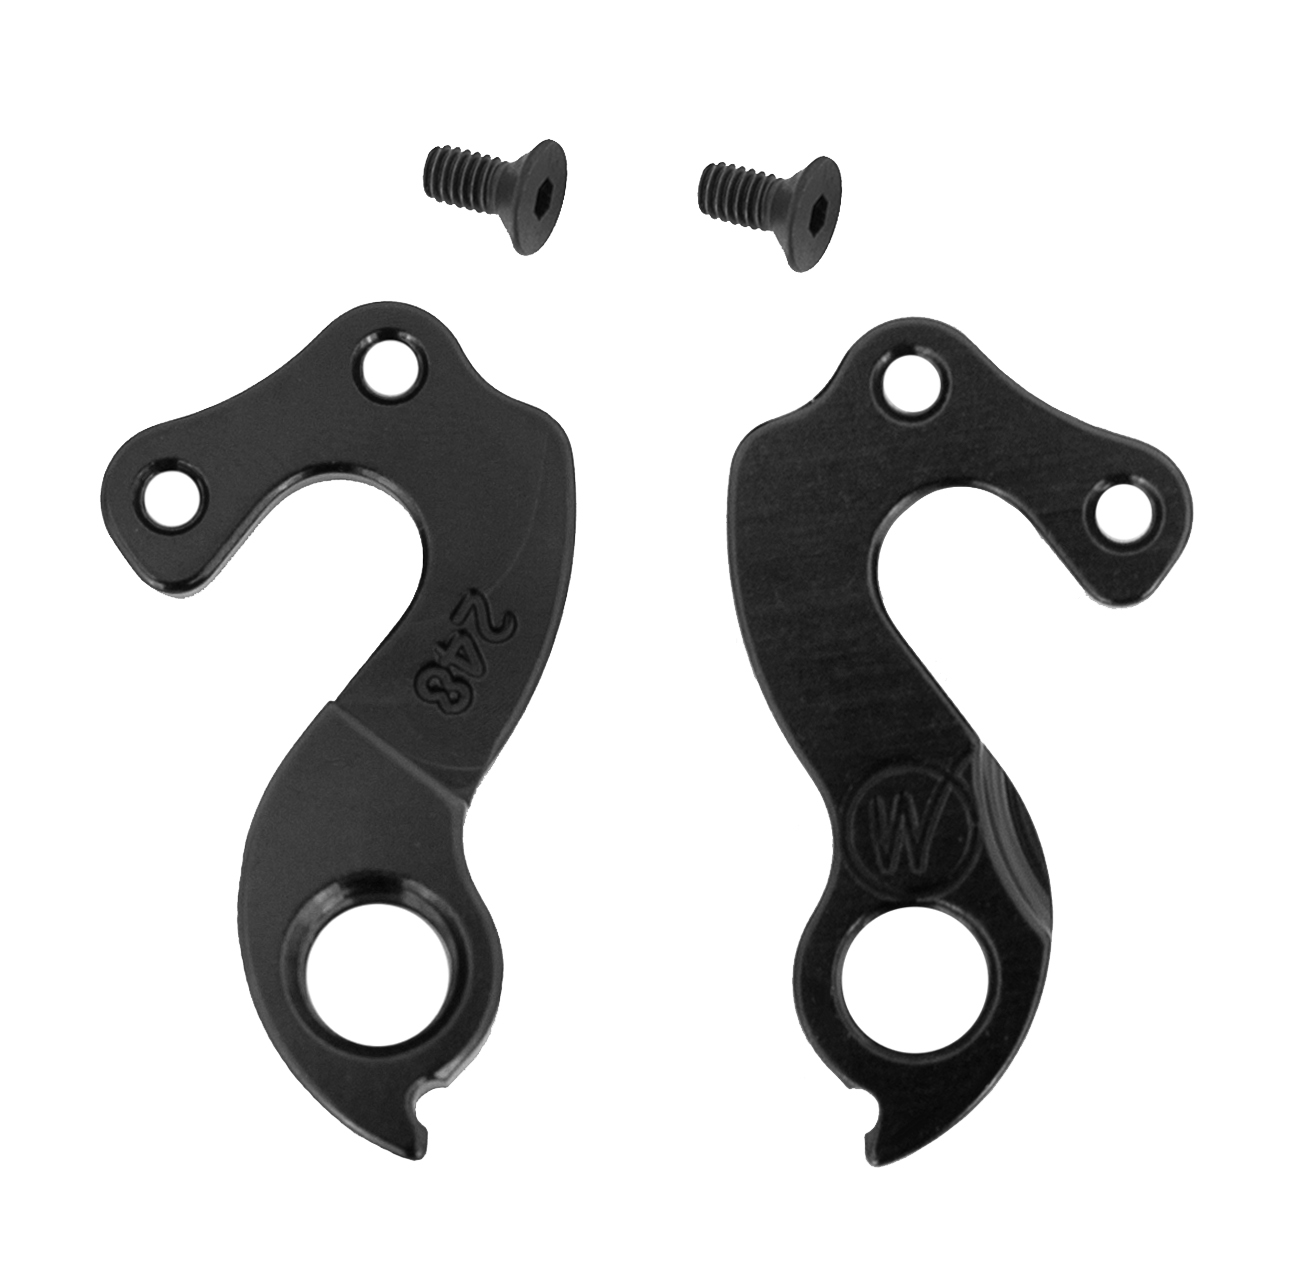 Wheels MFG Geardrop 248 | Derailleur hanger